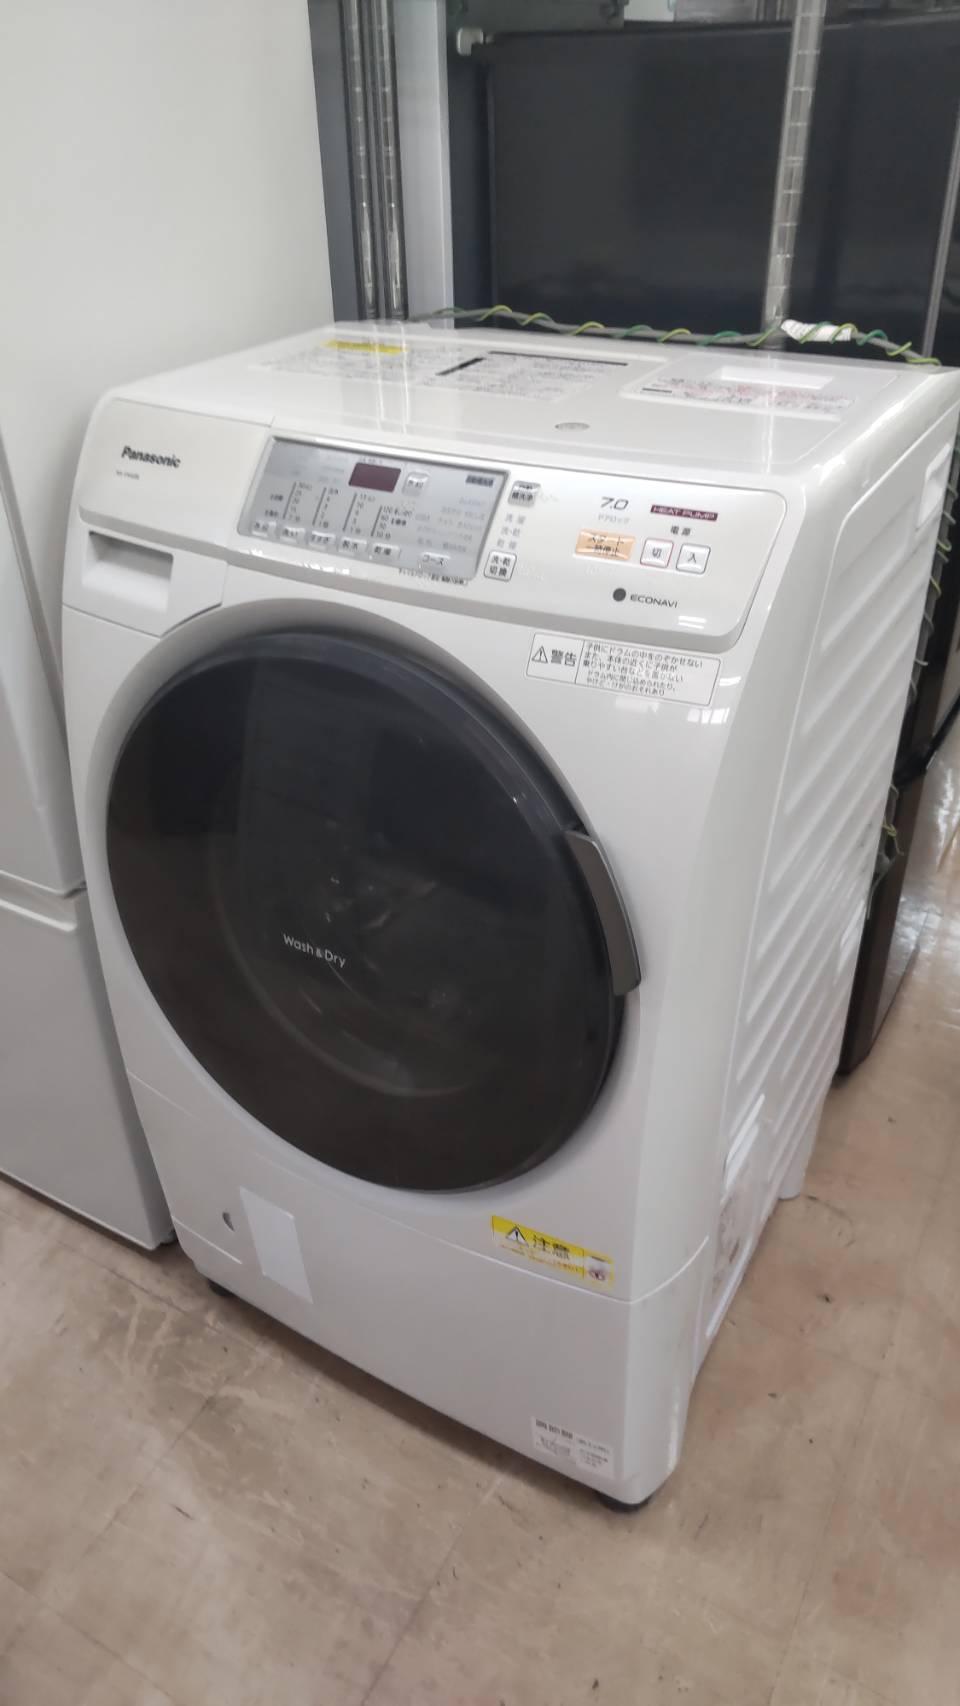 【Pnasonic パナソニック ドラム式 洗濯機 洗濯7kg 乾燥3.5kg NA-VH32L プチドラム econavi 搭載 ヒートポンプ 乾燥】を買取させて頂きました!⭐福岡市 早良区 リサイクルショップ リサイクルマート原店⭐の買取-